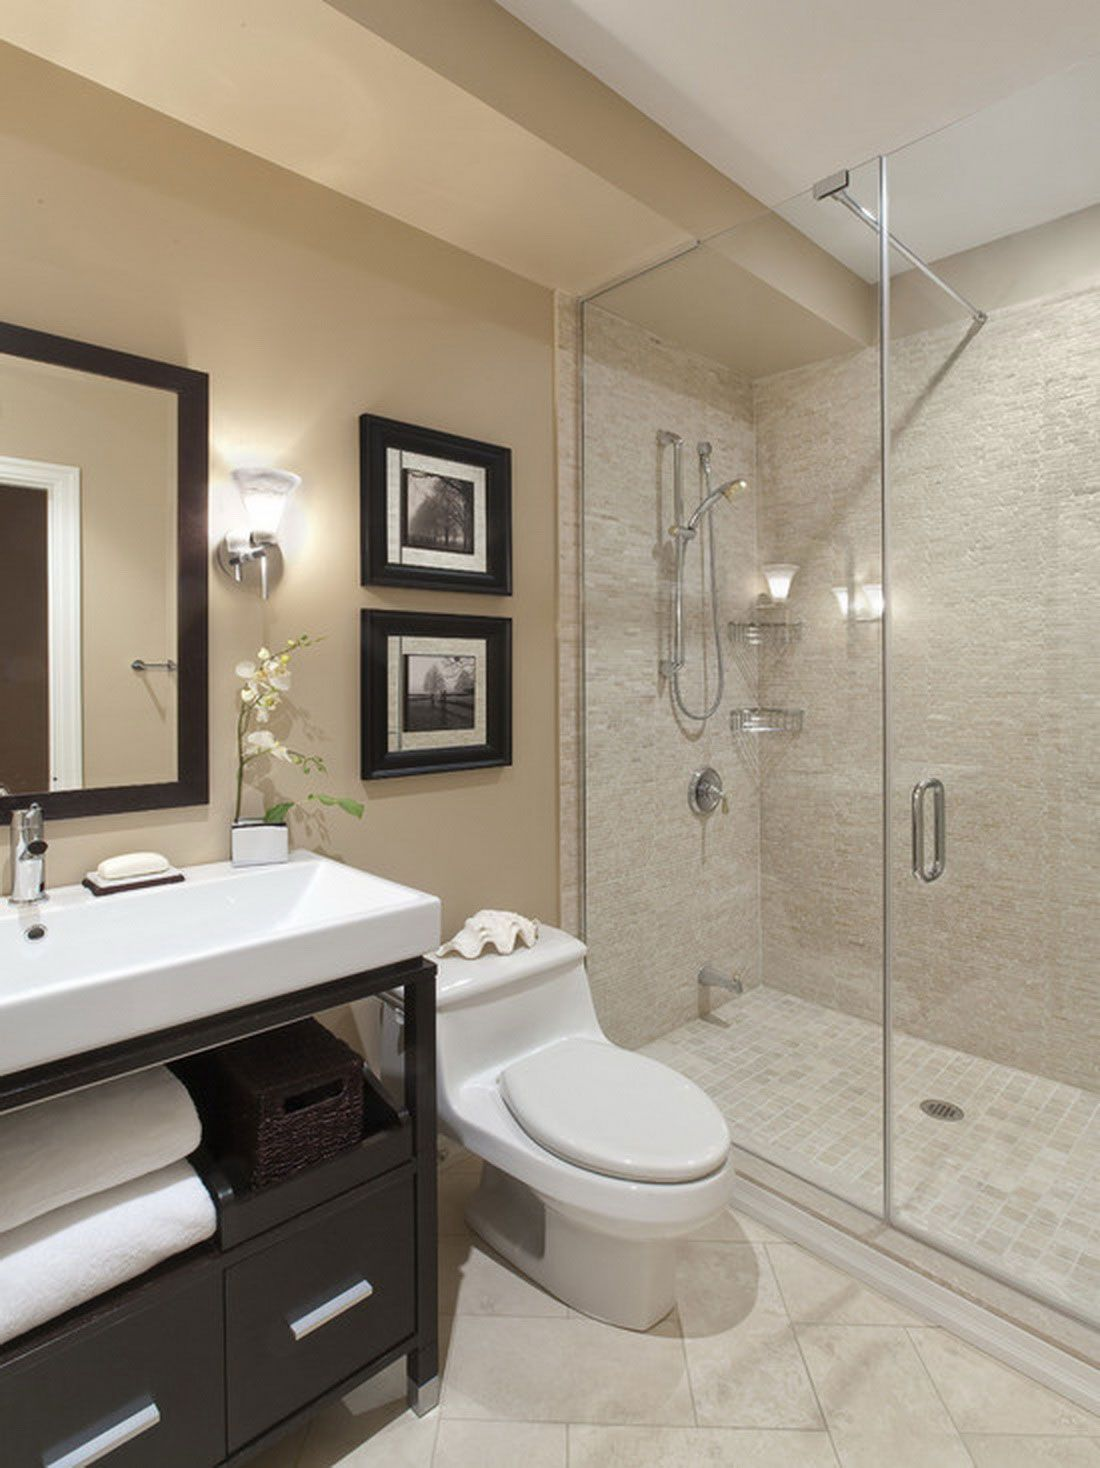 25 Modern Bathroom Design Ideas Transitional Bathroom Design